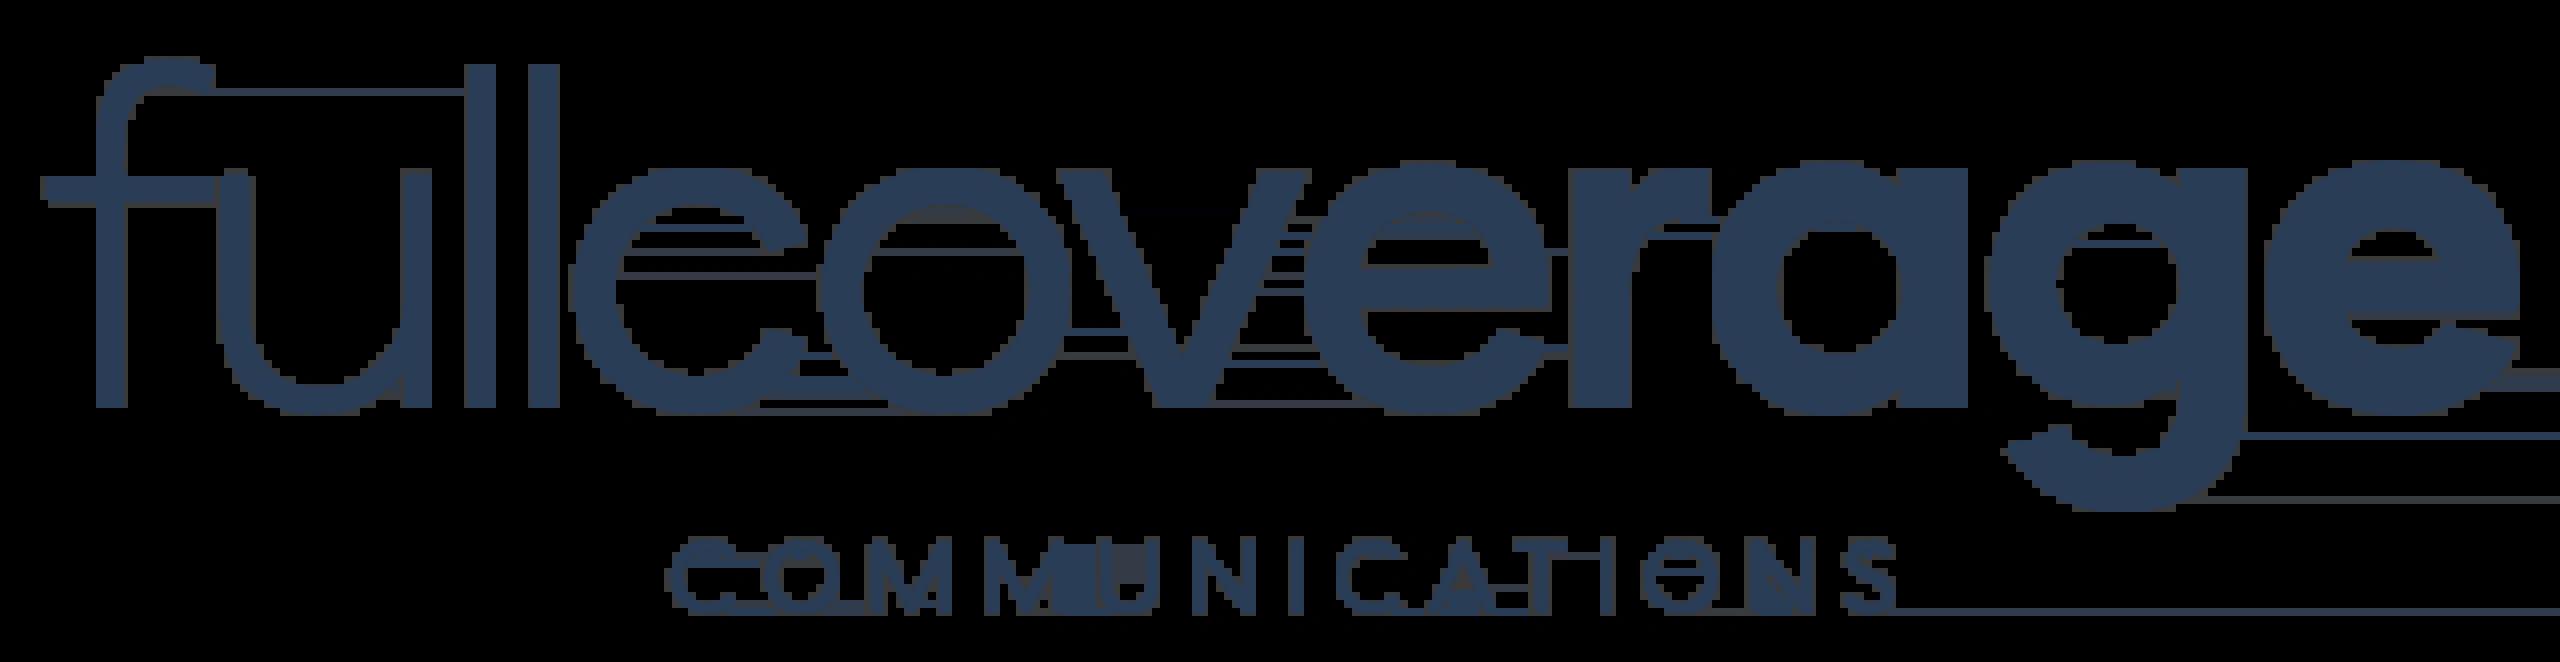 fullcoveragecommunications.com